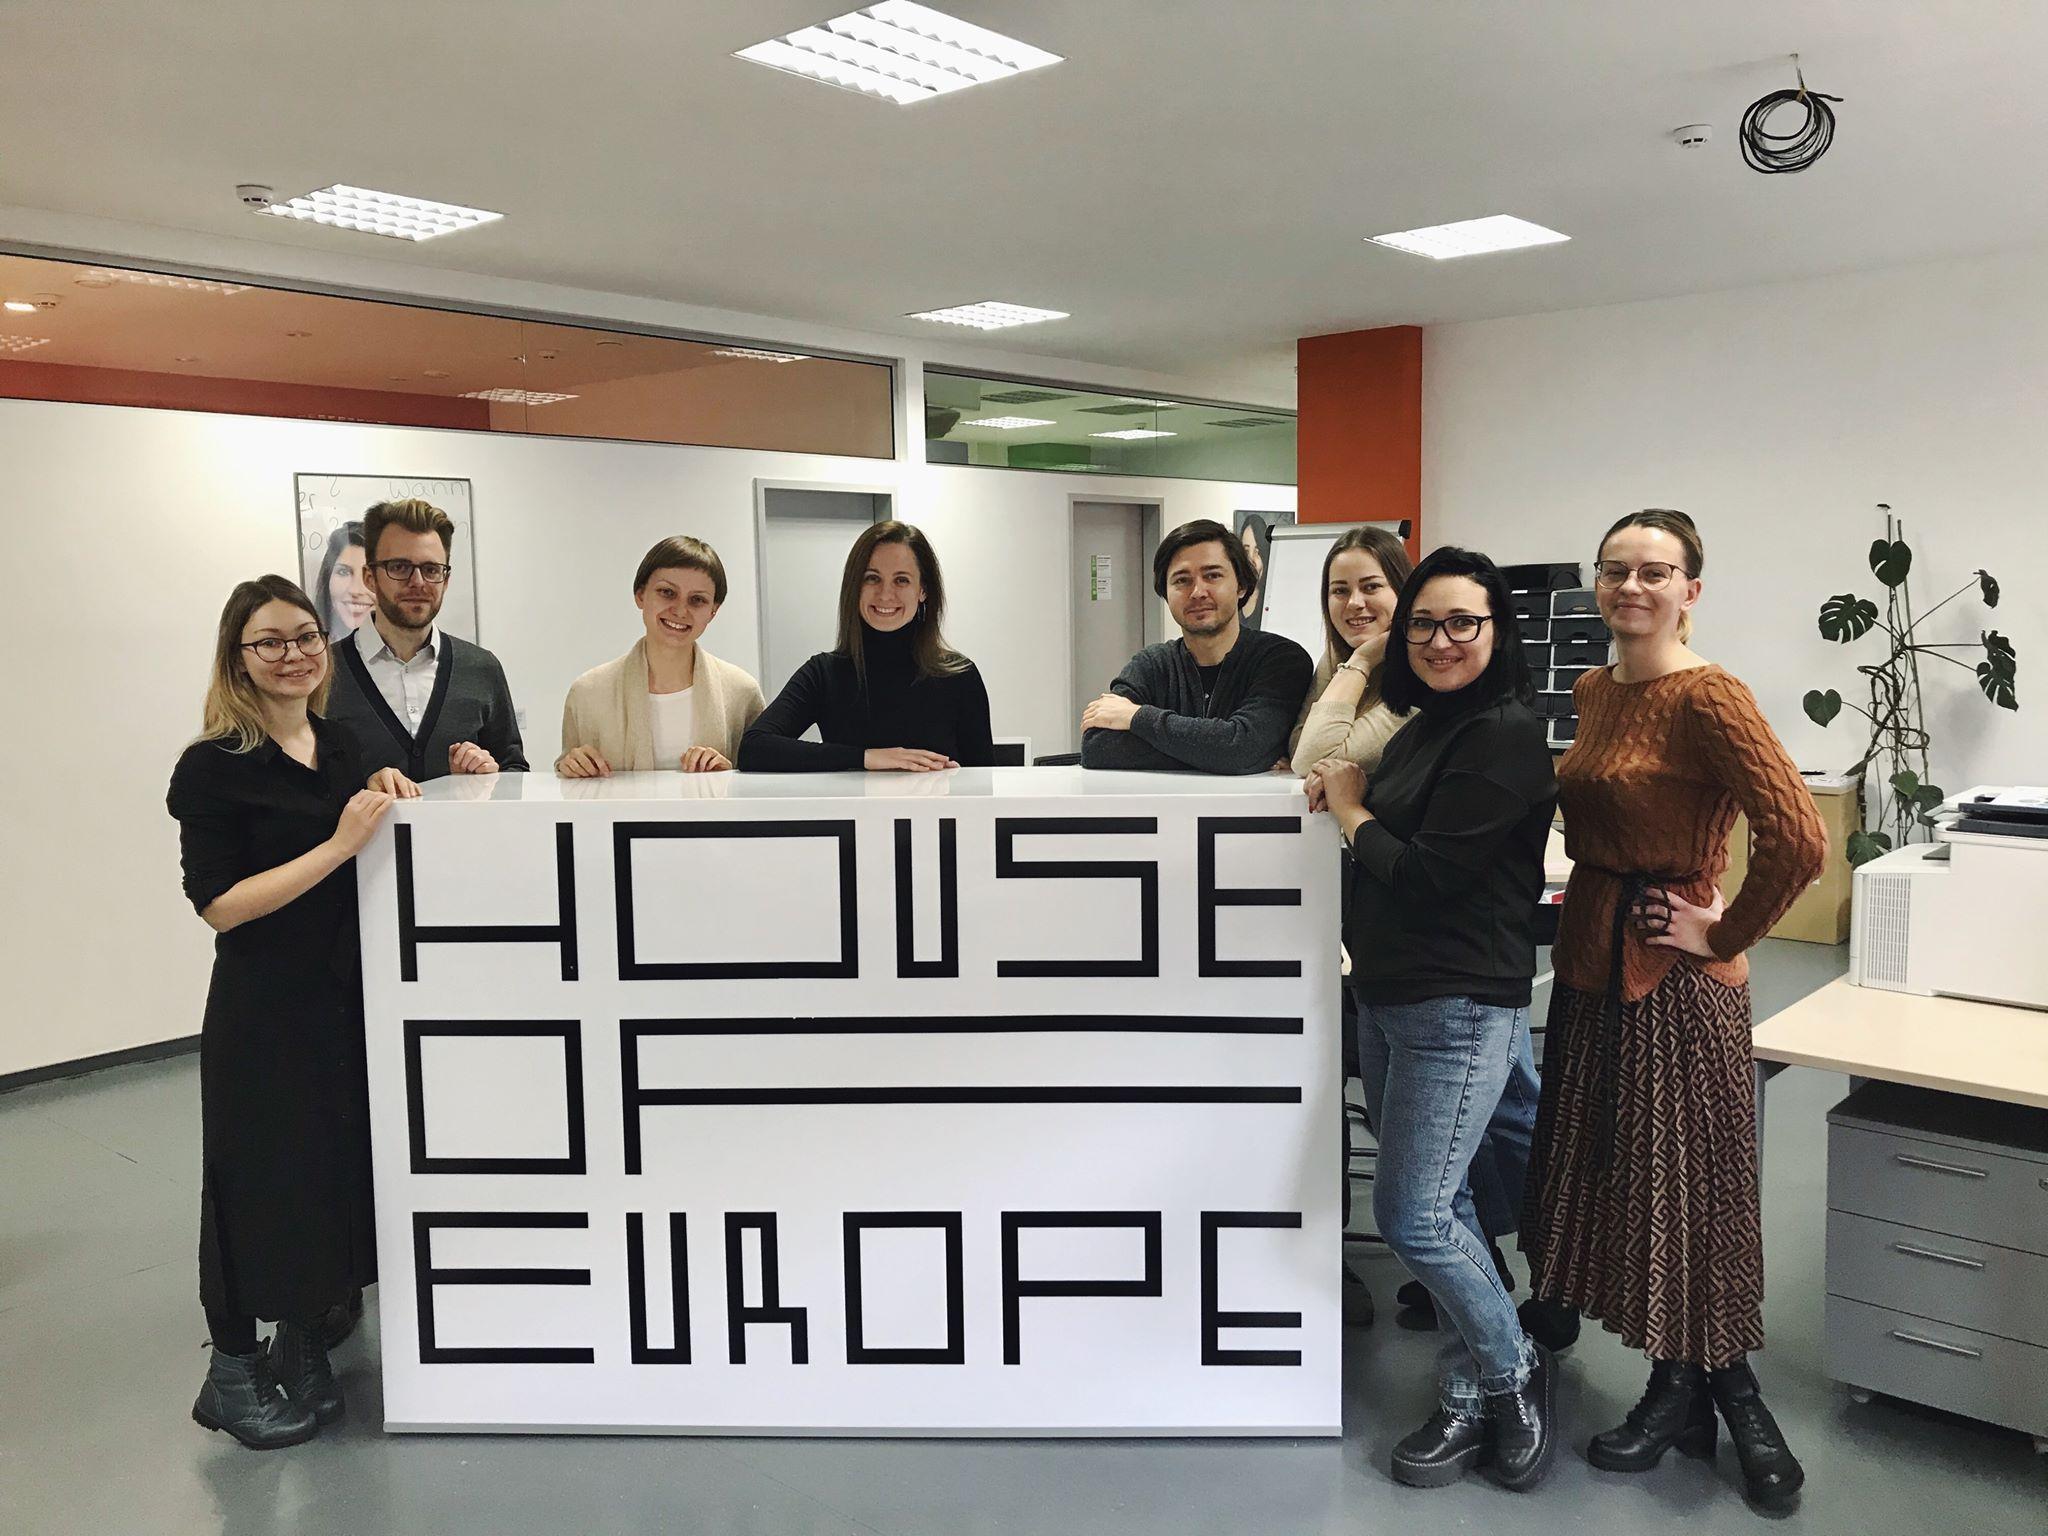 Центр сучасної культури став поп-ап хабом House of Europe